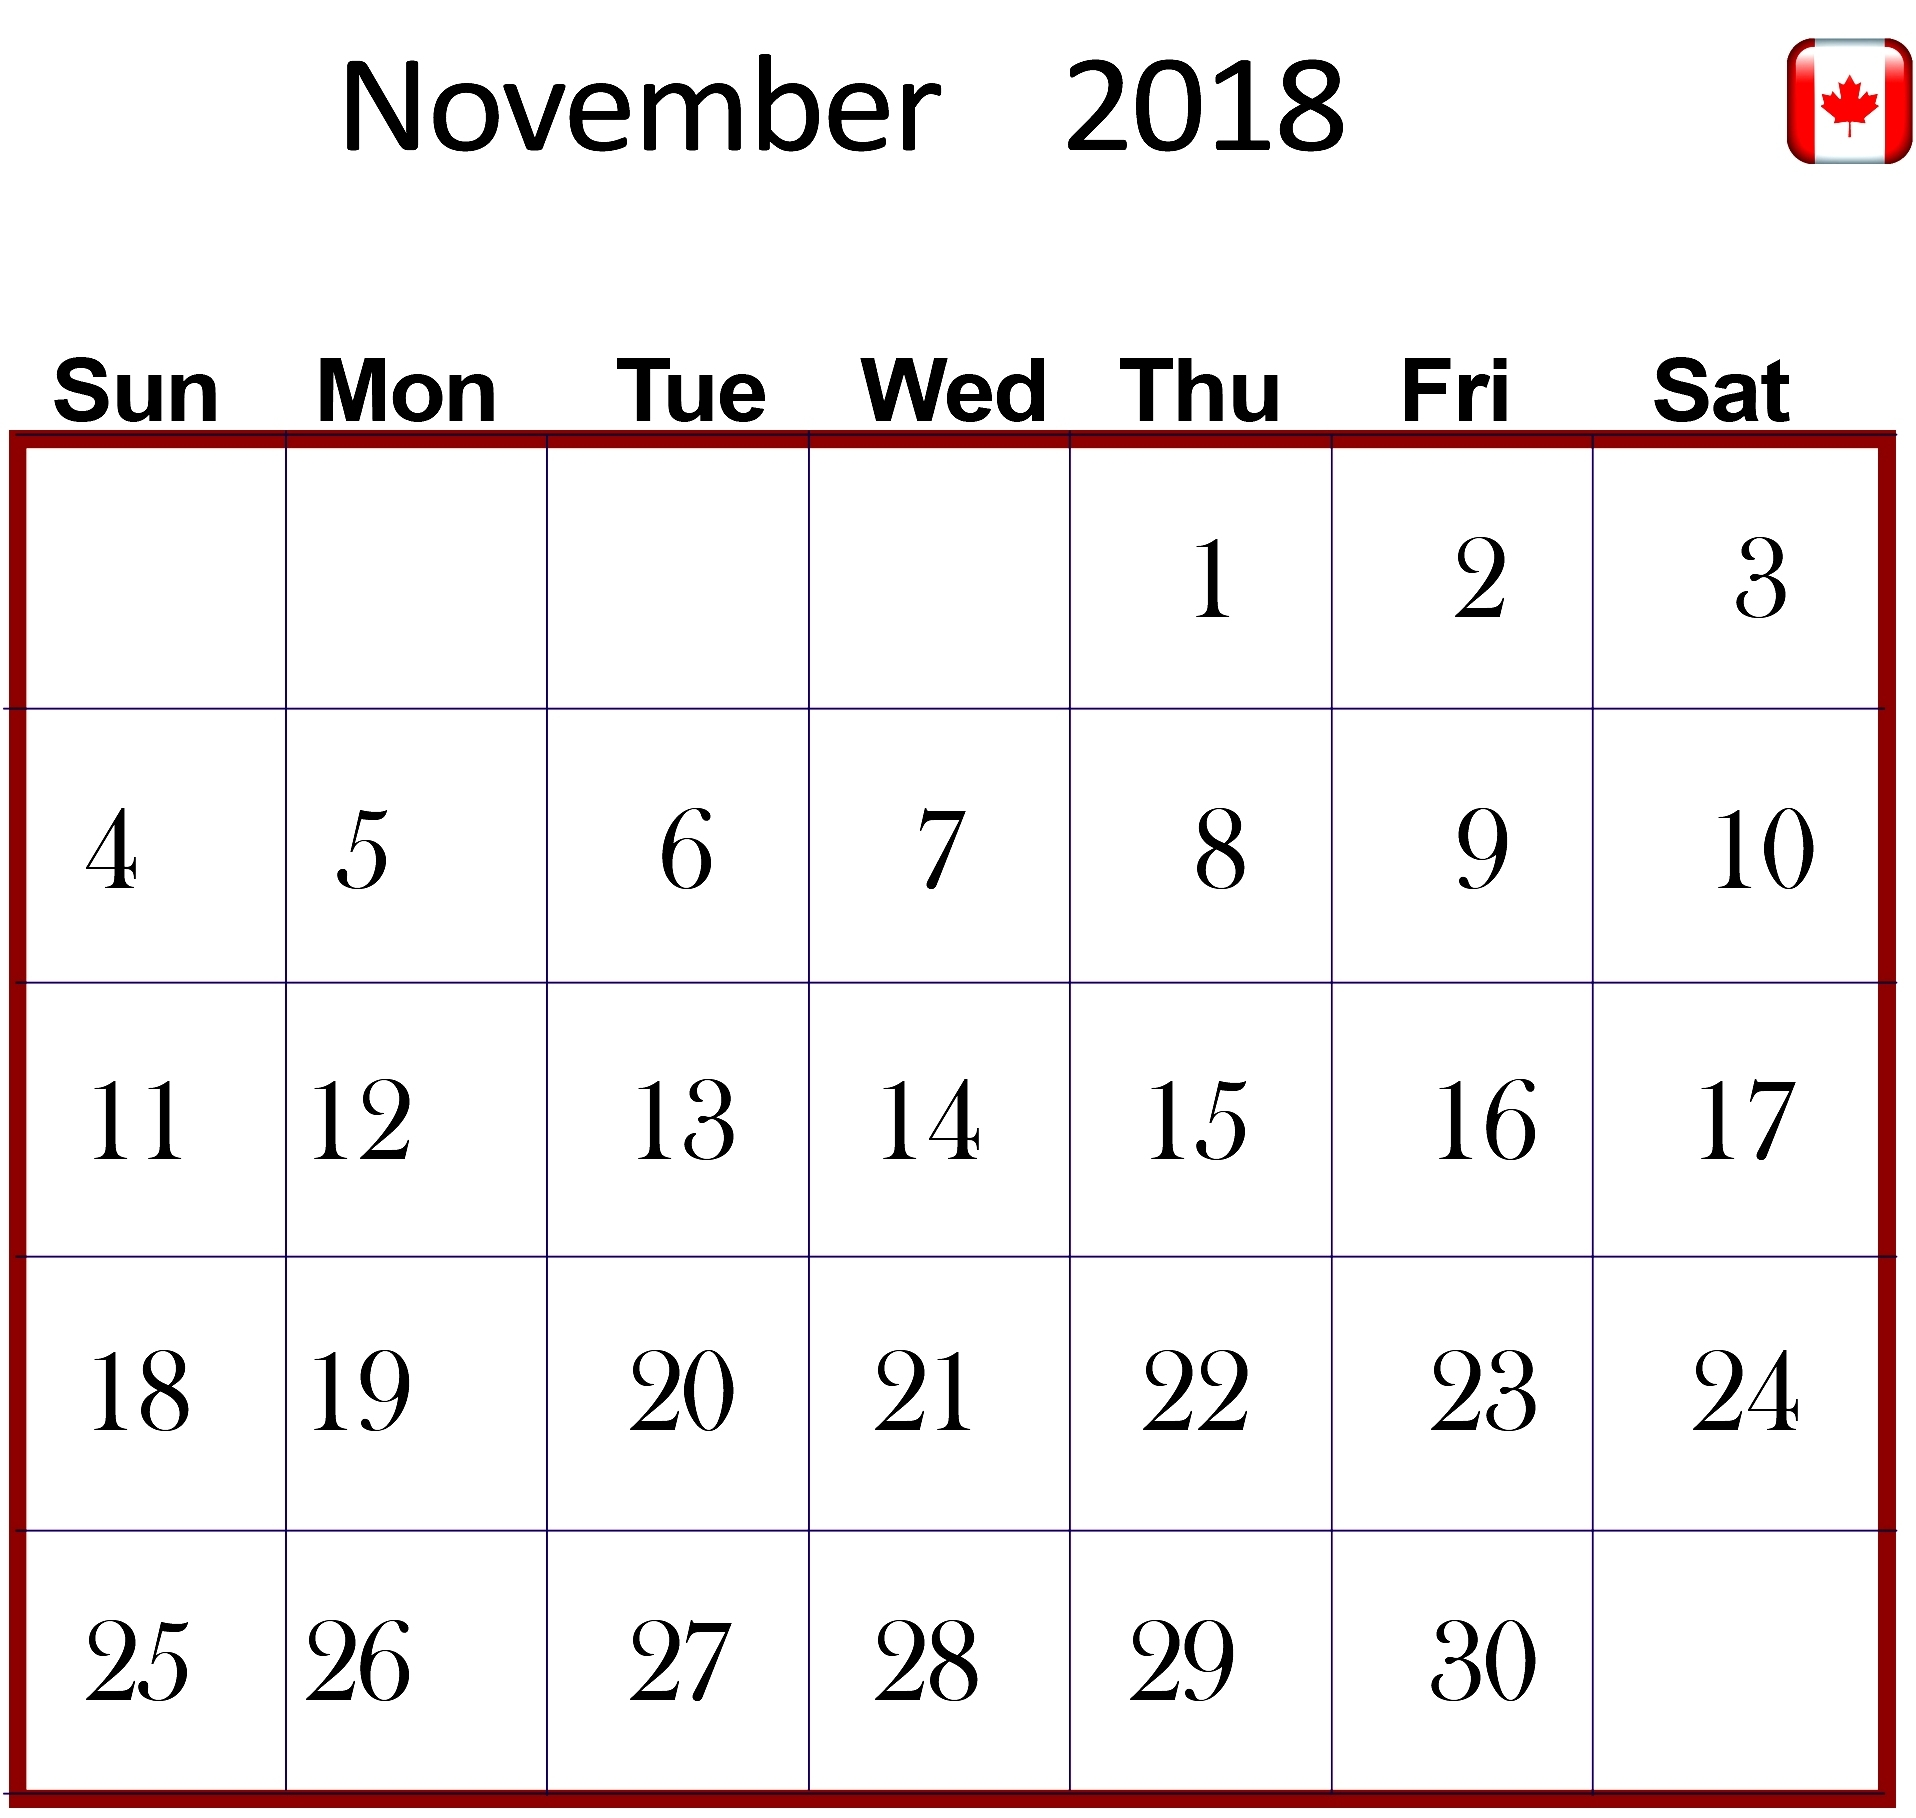 november 2018 calendar canada best calendar printable pdf::November 2018 Calendar Canada